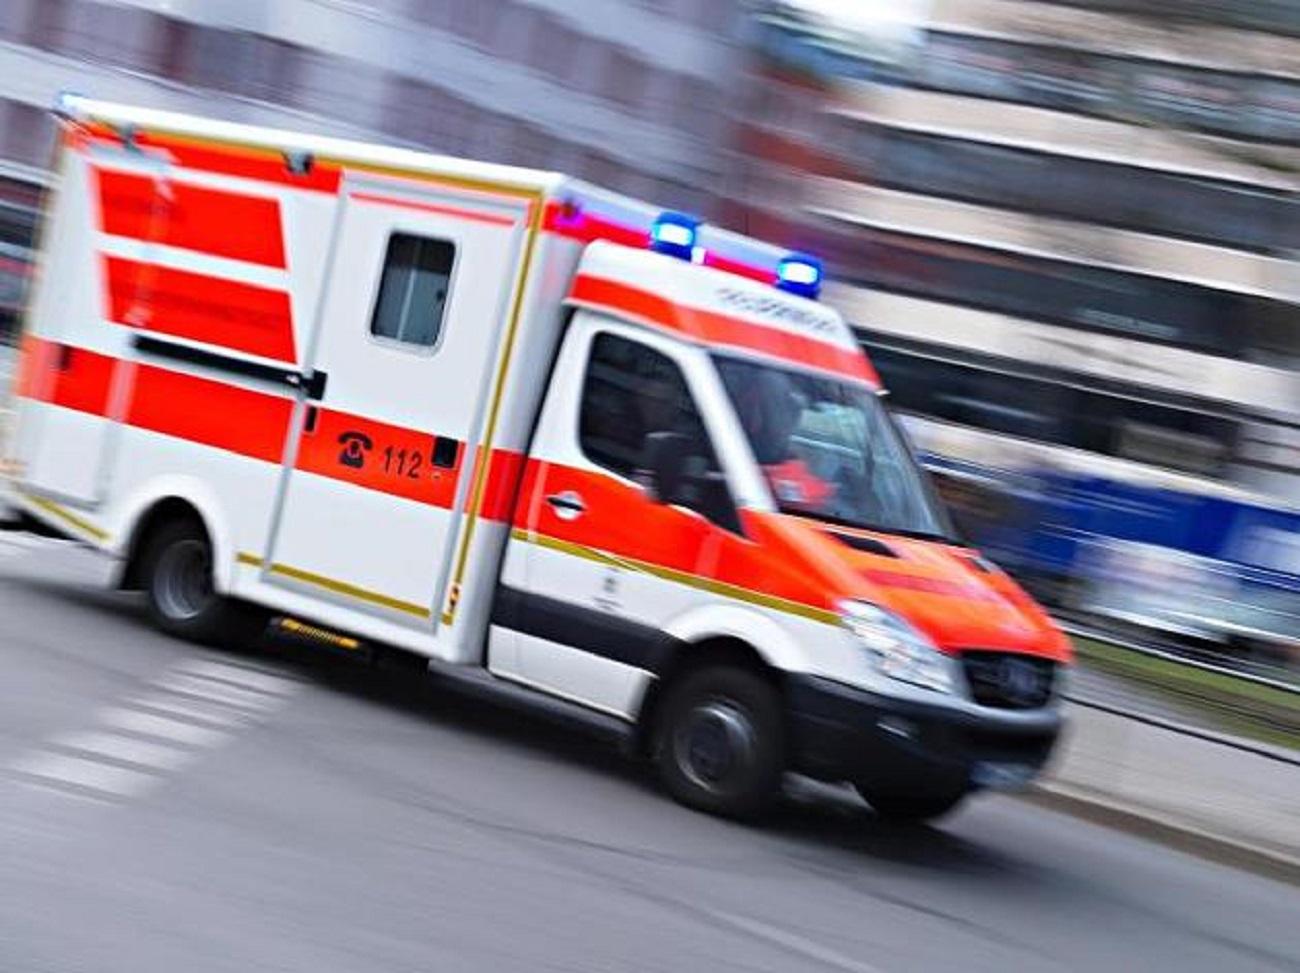 Натрассе вЧувашии шофёр «Ниссан» врезался в фургон и умер